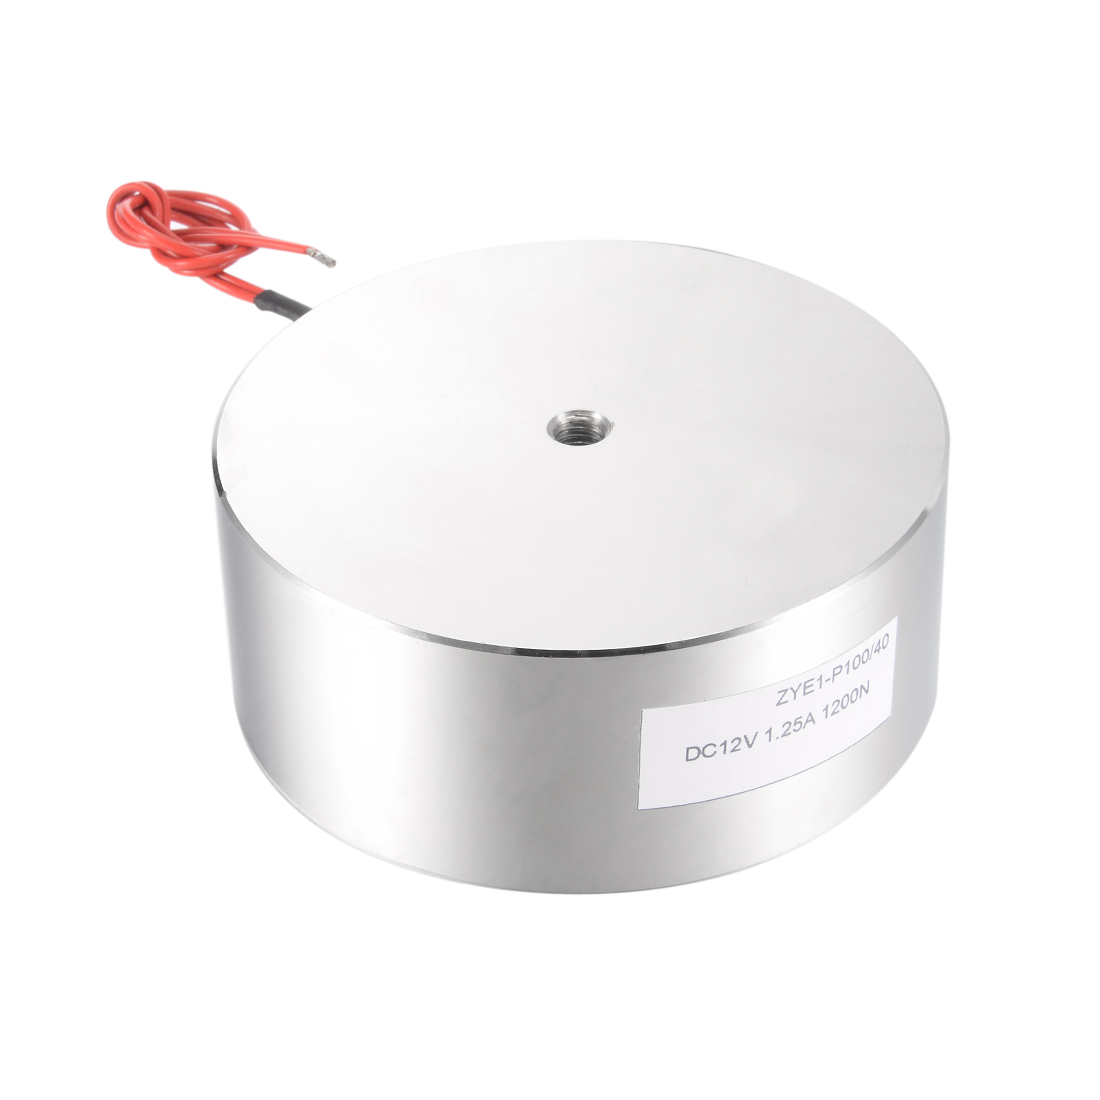 100mm x 40mm DC12V 1.25A 1200N Sucking Disc Solenoid Lift Holding Electromagnet